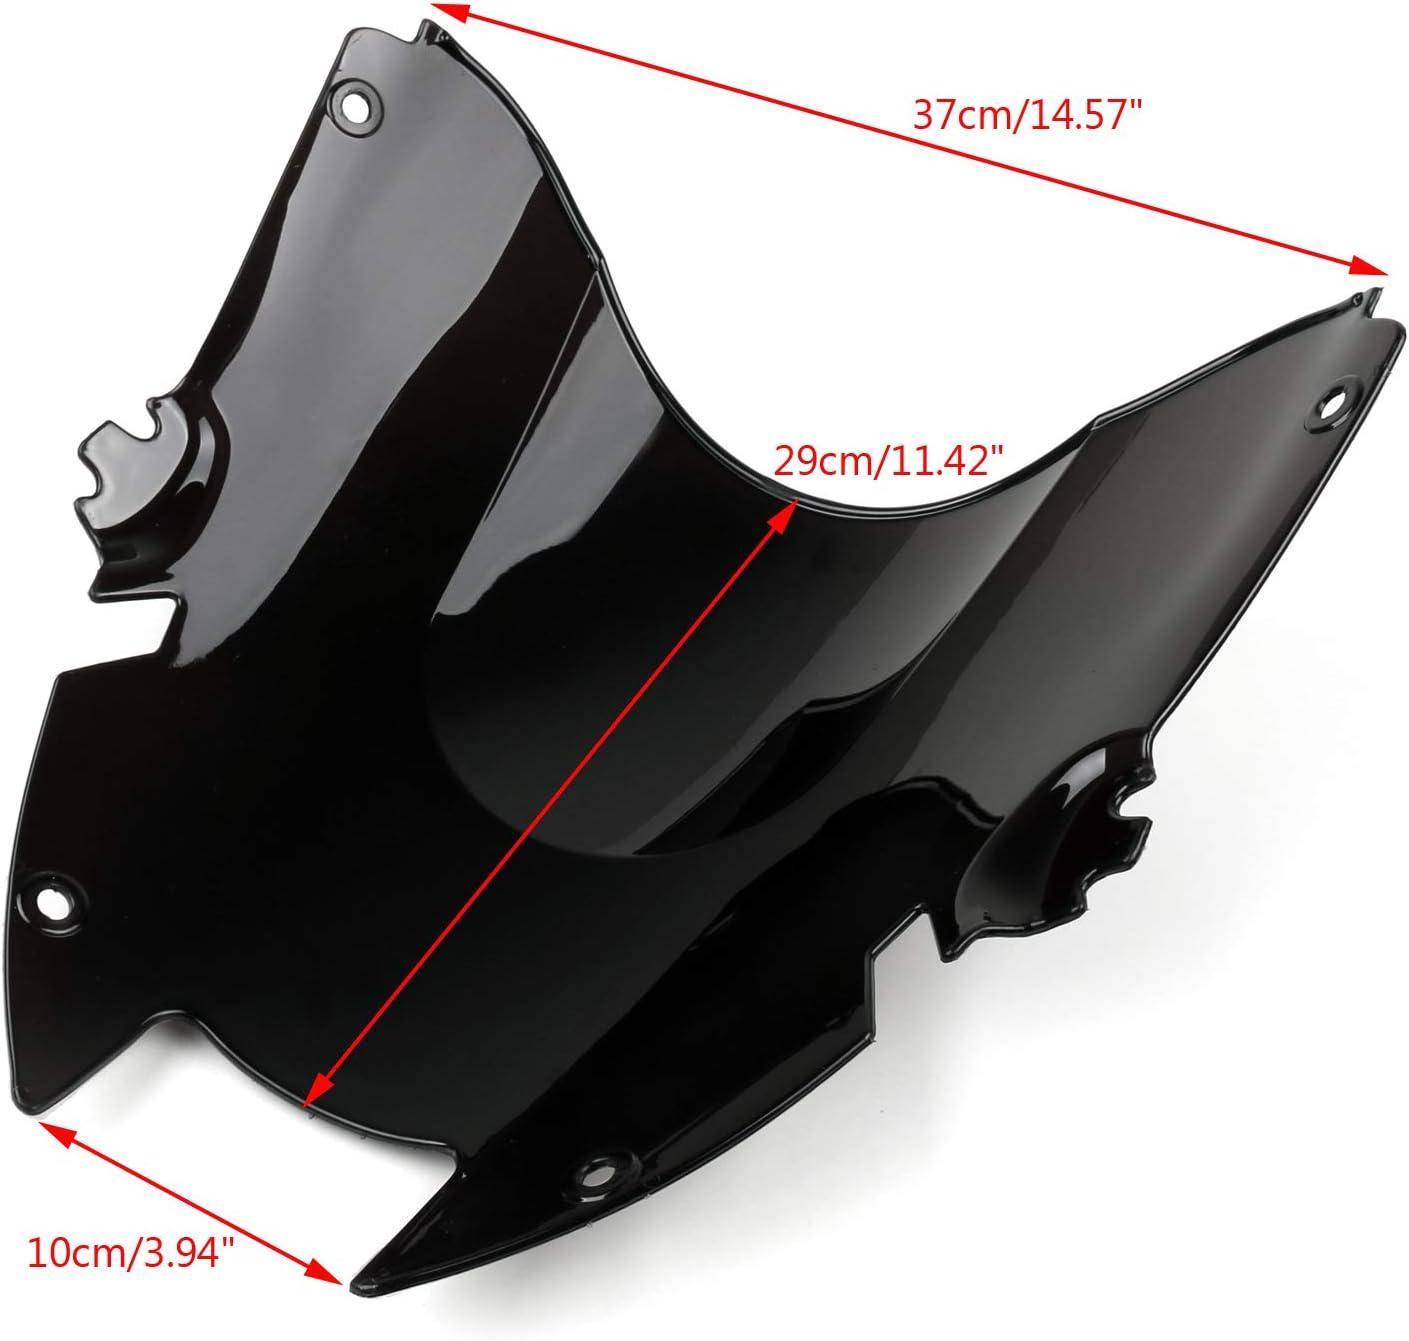 05 Areyourshop Windshield WindScreen For VTR1000F VTR1000 Firestorm SuperHawk 97